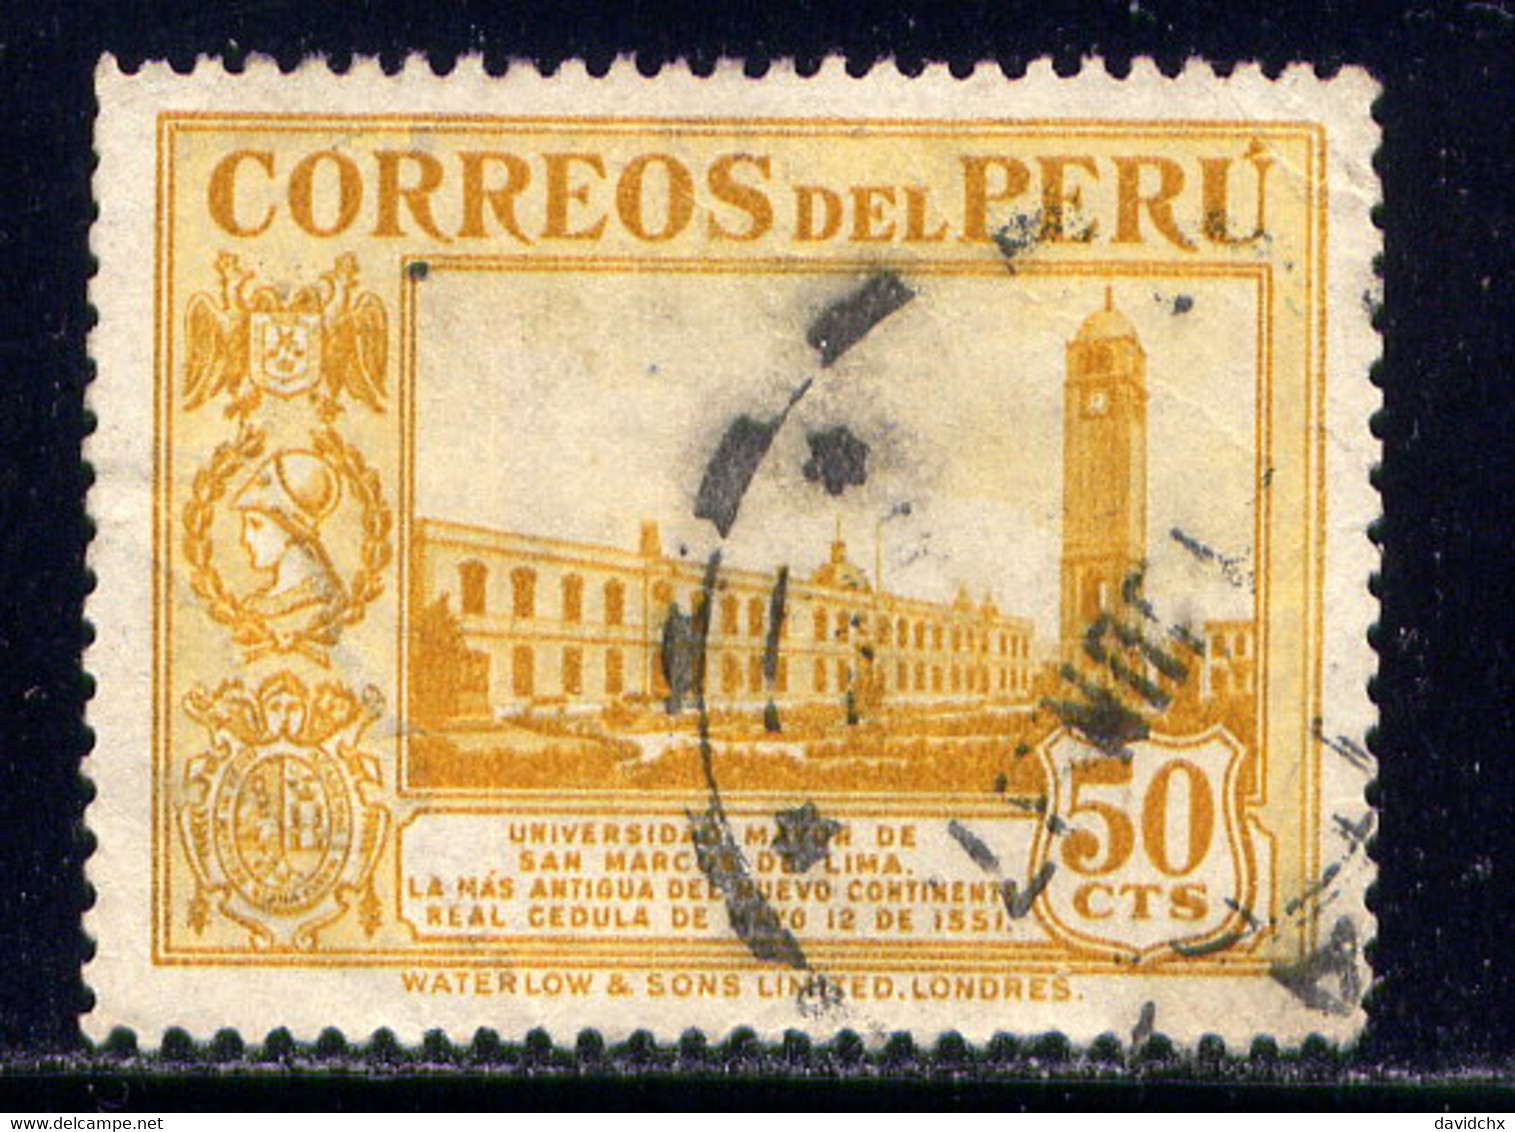 PERU, NO. 366 - Peru